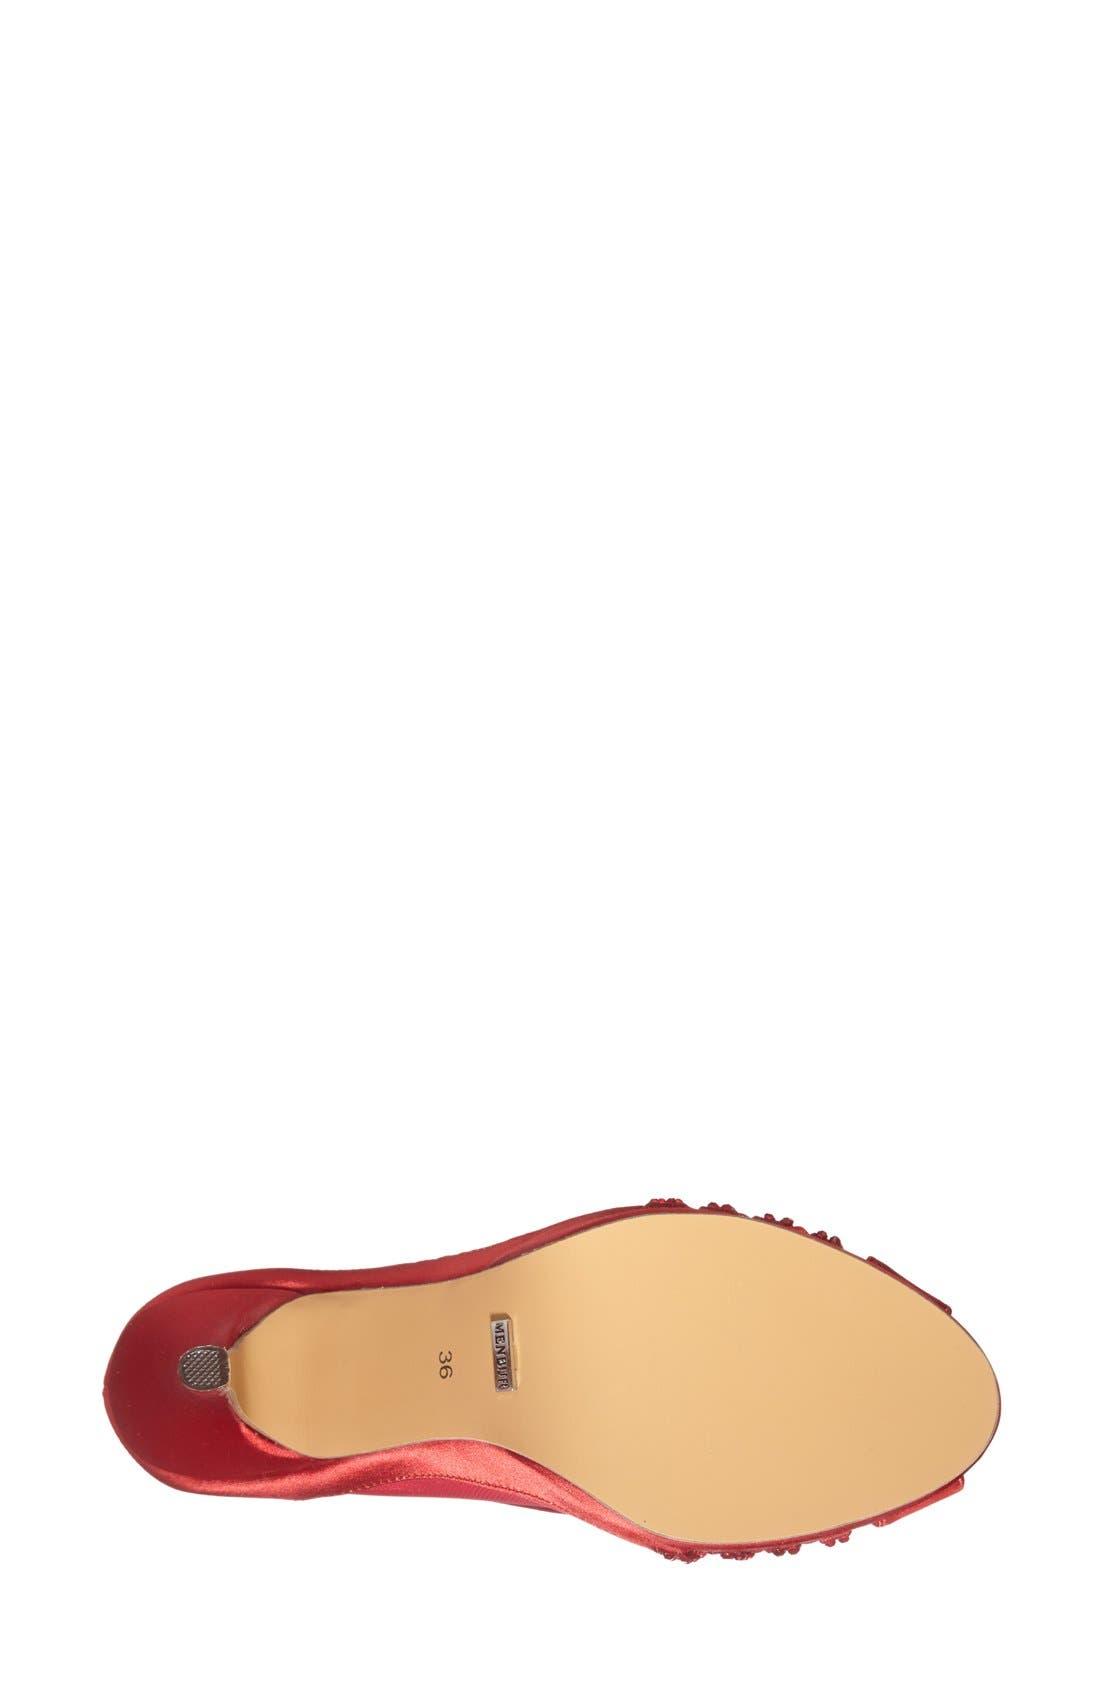 Alternate Image 4  - Menbur 'Balcones' Peep Toe Pump (Women)